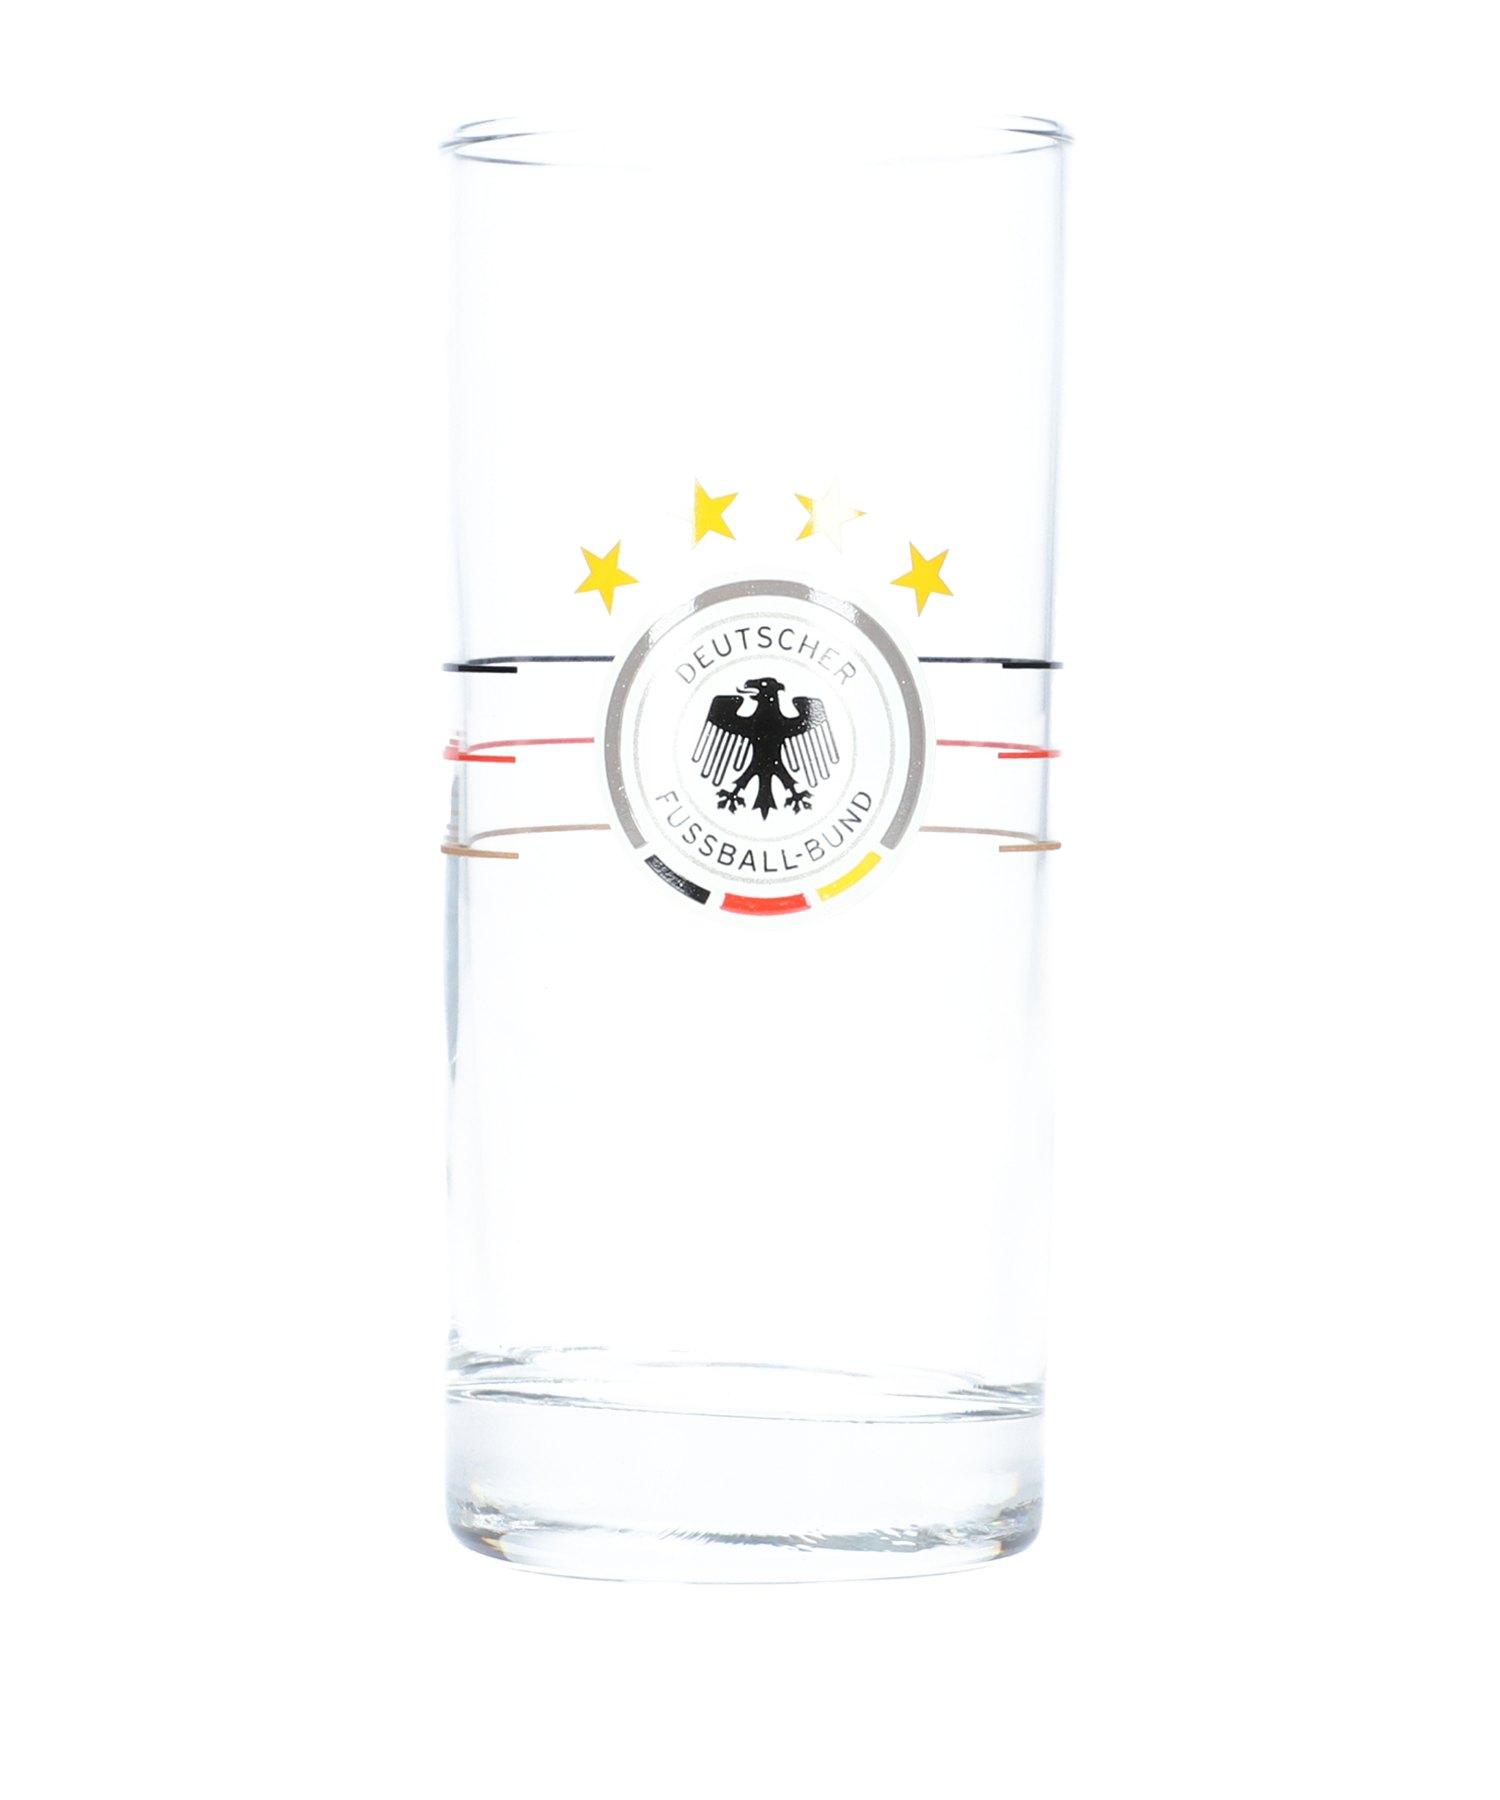 DFB Deutschland 2er Set Trinkgläser Weiss - Weiss